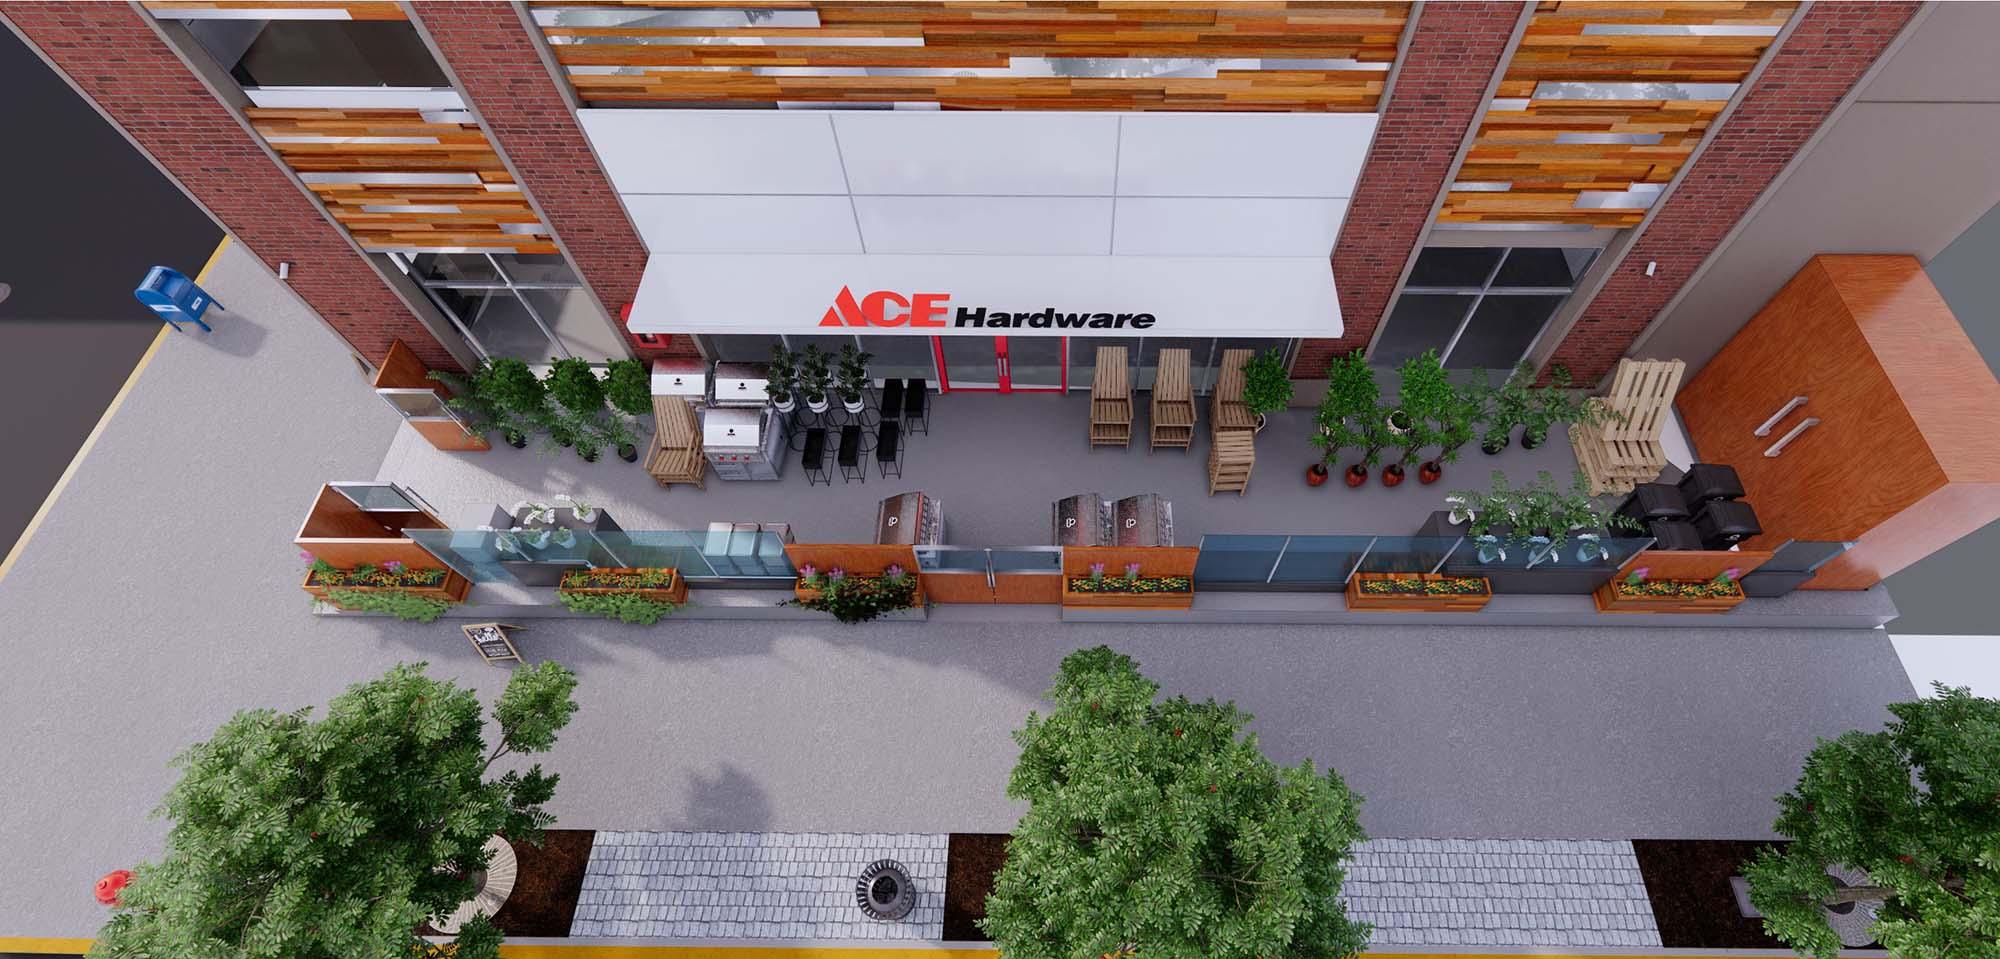 ACE Hardware Sheps Midtown exterior rendering